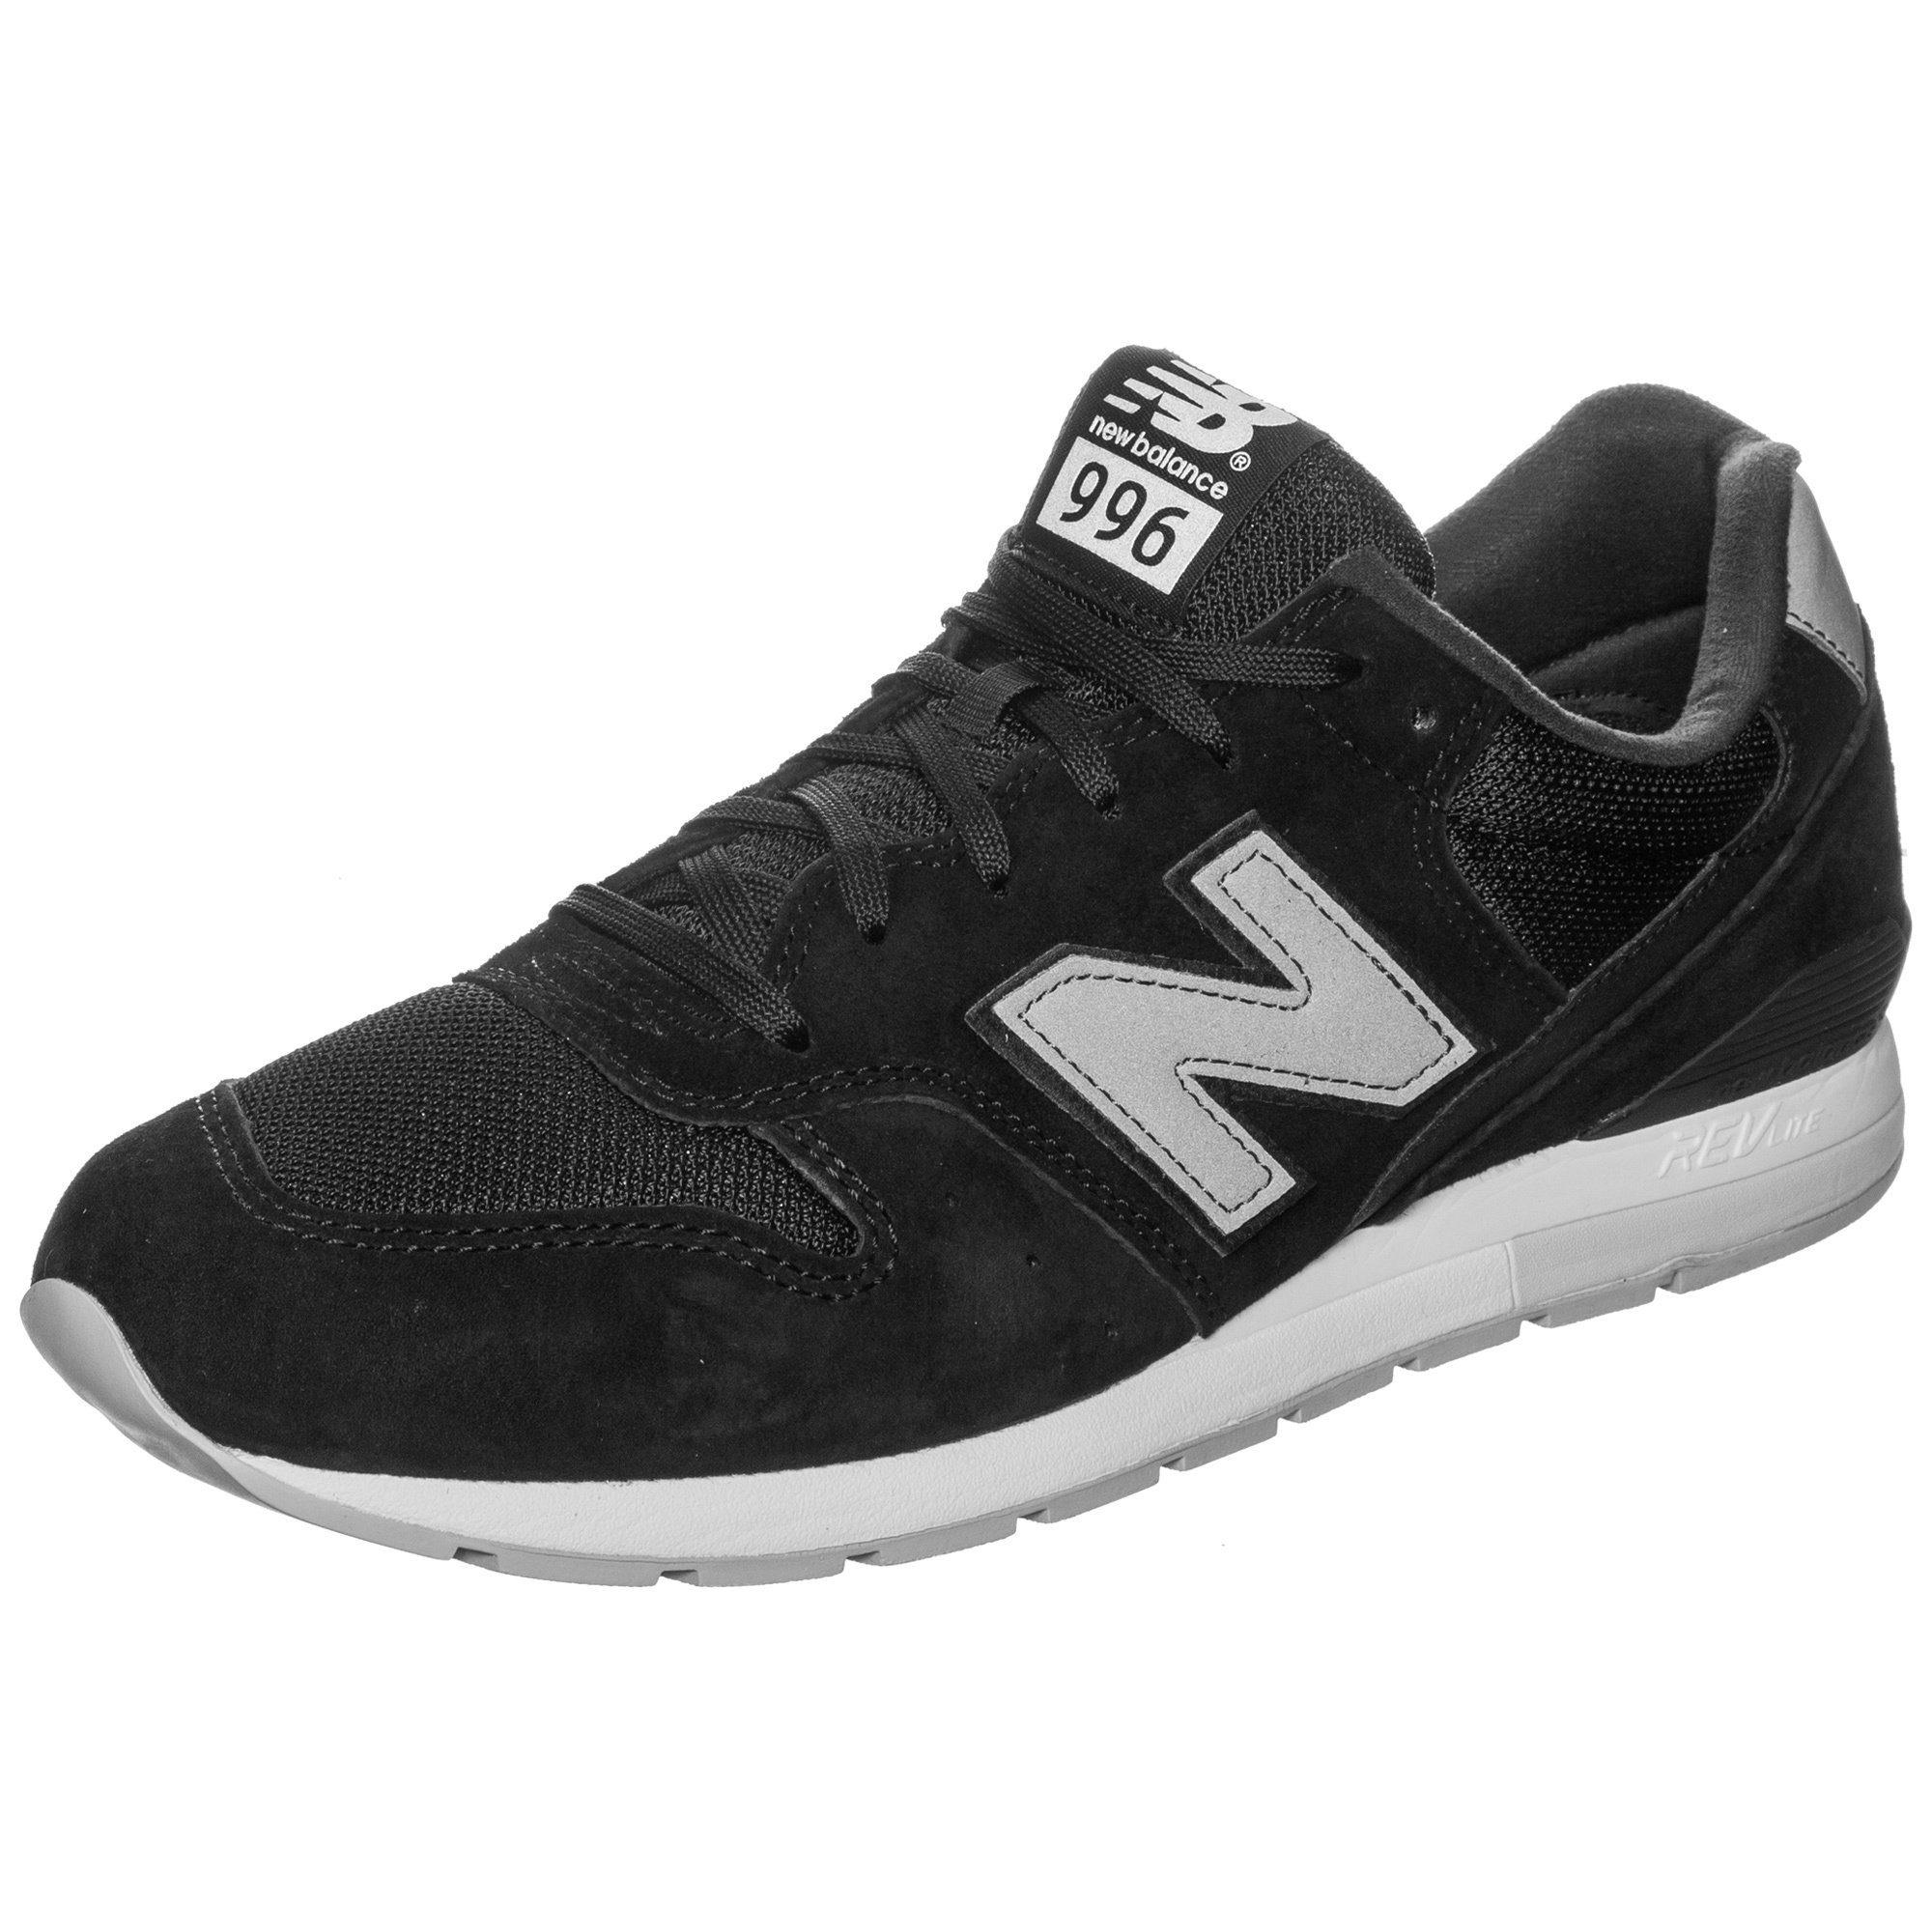 New Balance MRL996-JN-D Sneaker online kaufen  schwarz #ft5_slash# grau